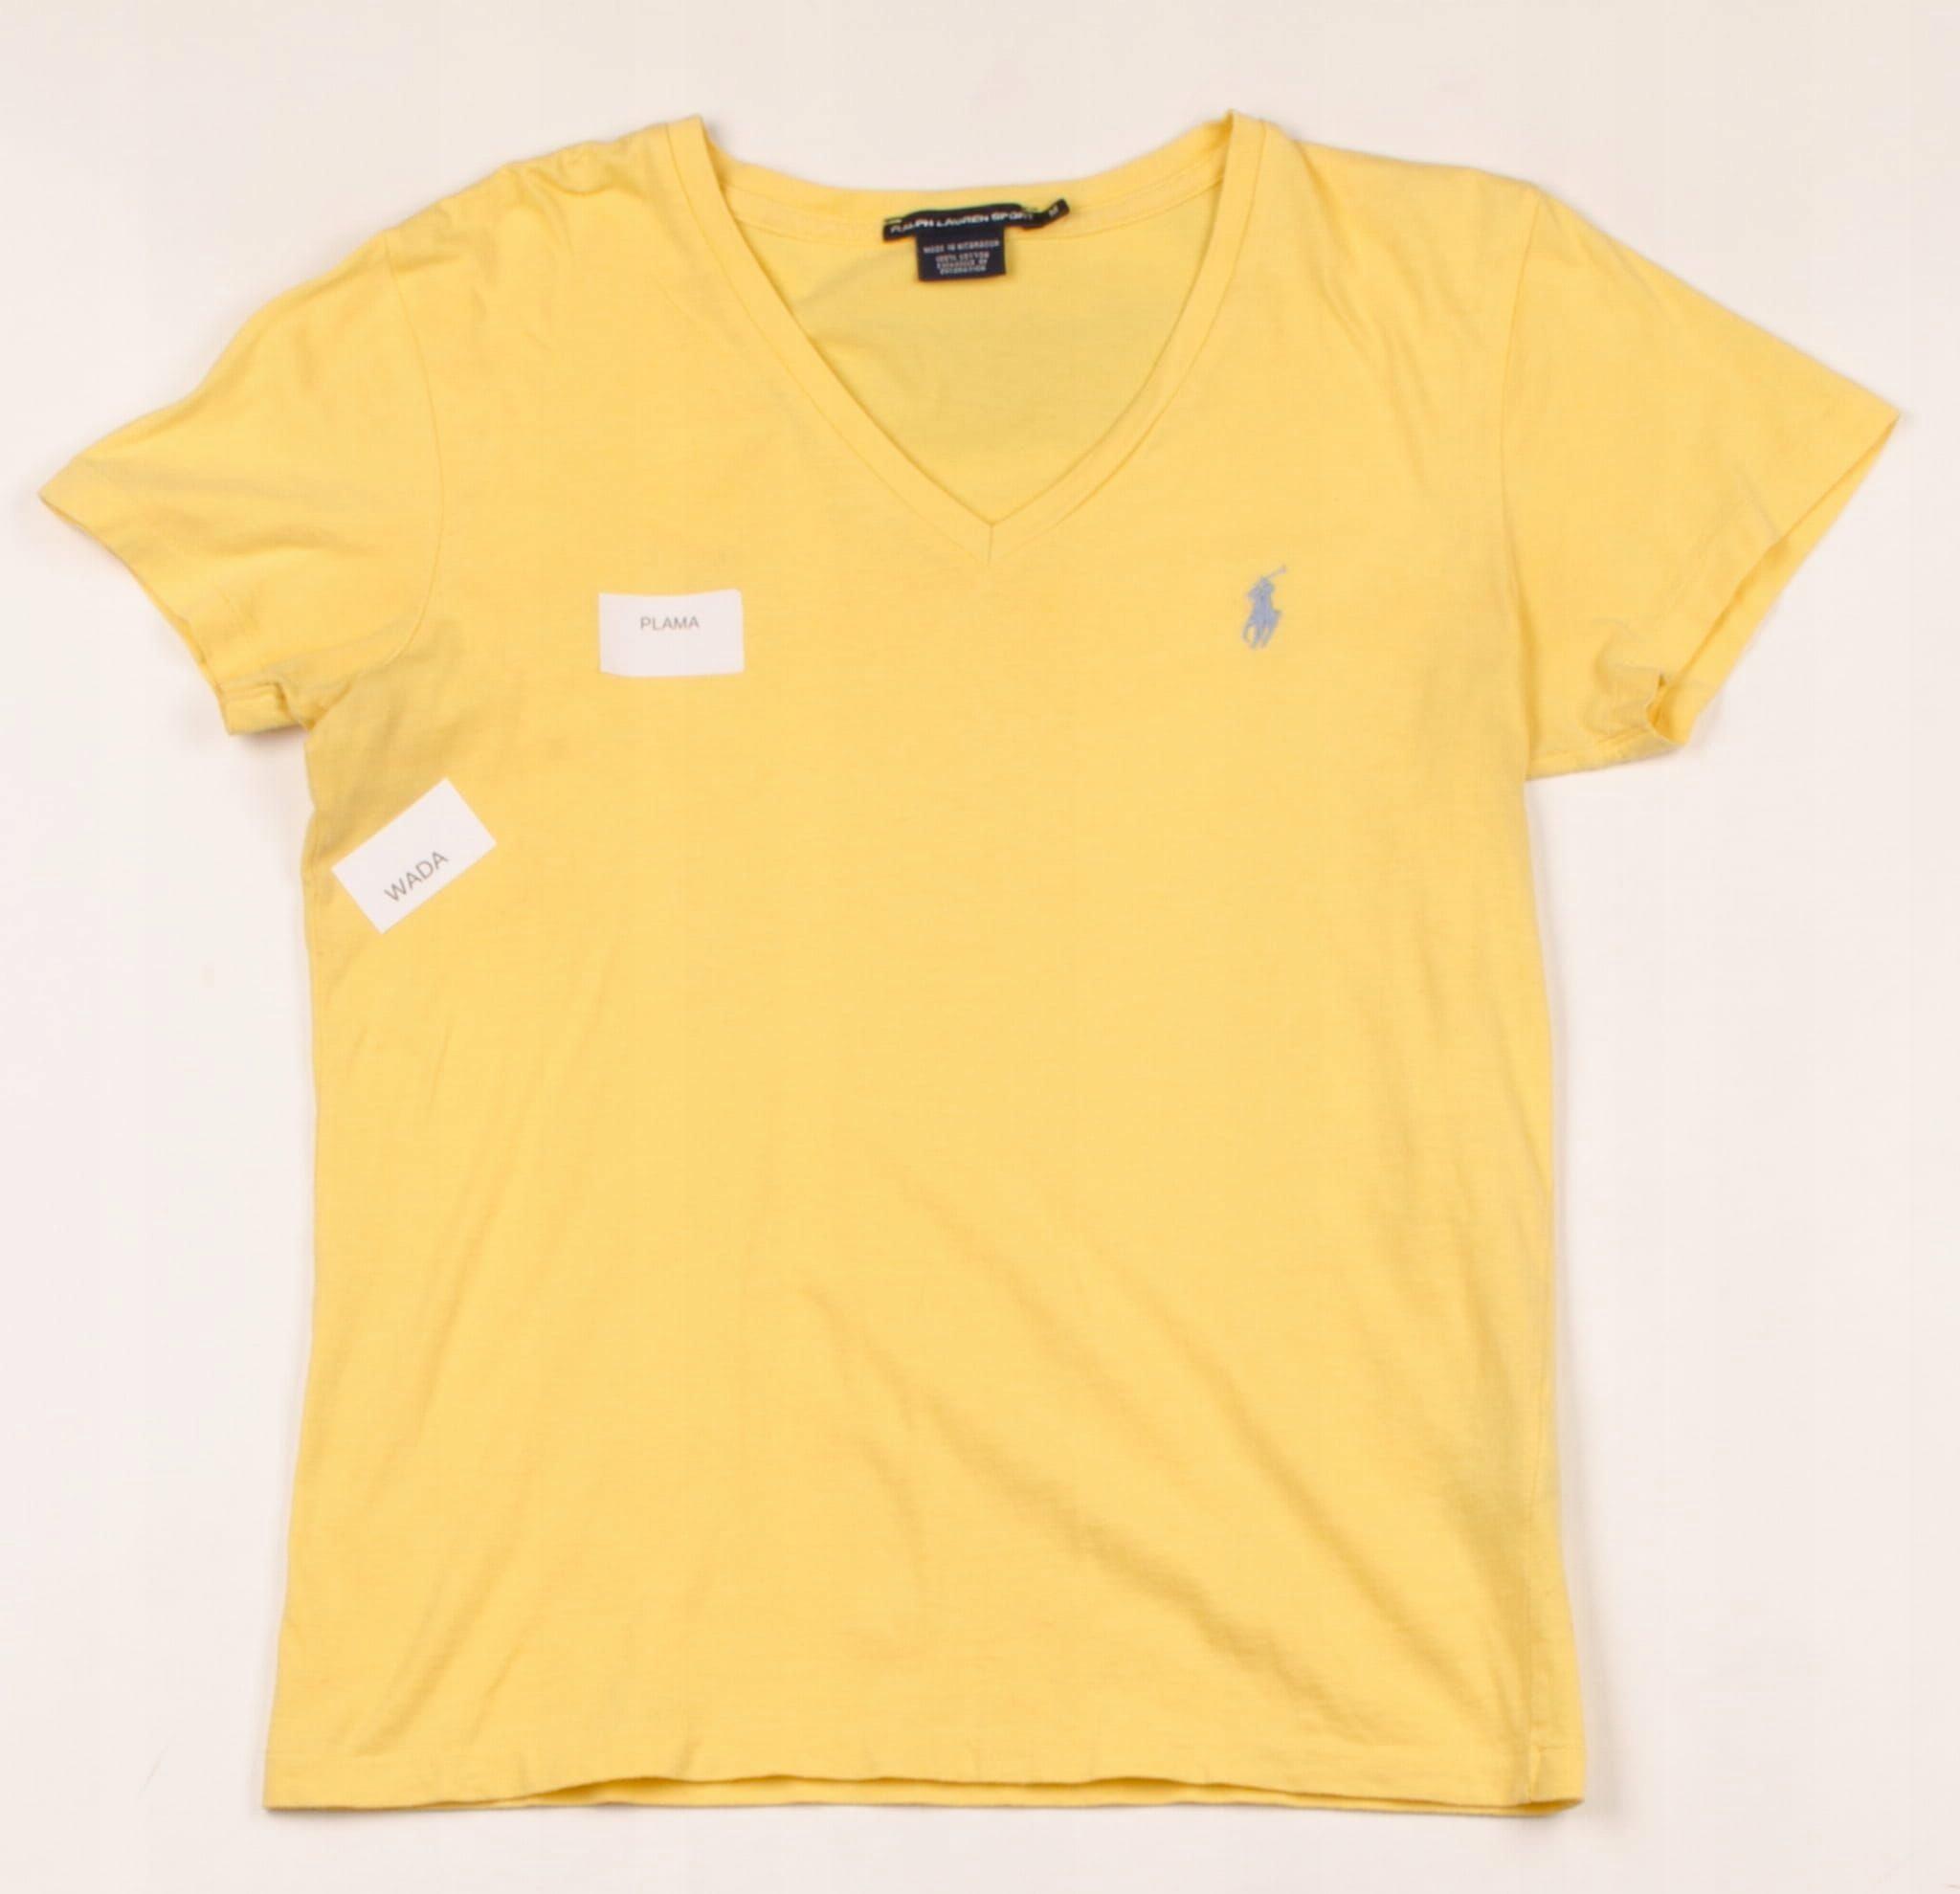 32730 MICRO WADA Ralph Lauren T-shirt Damski M